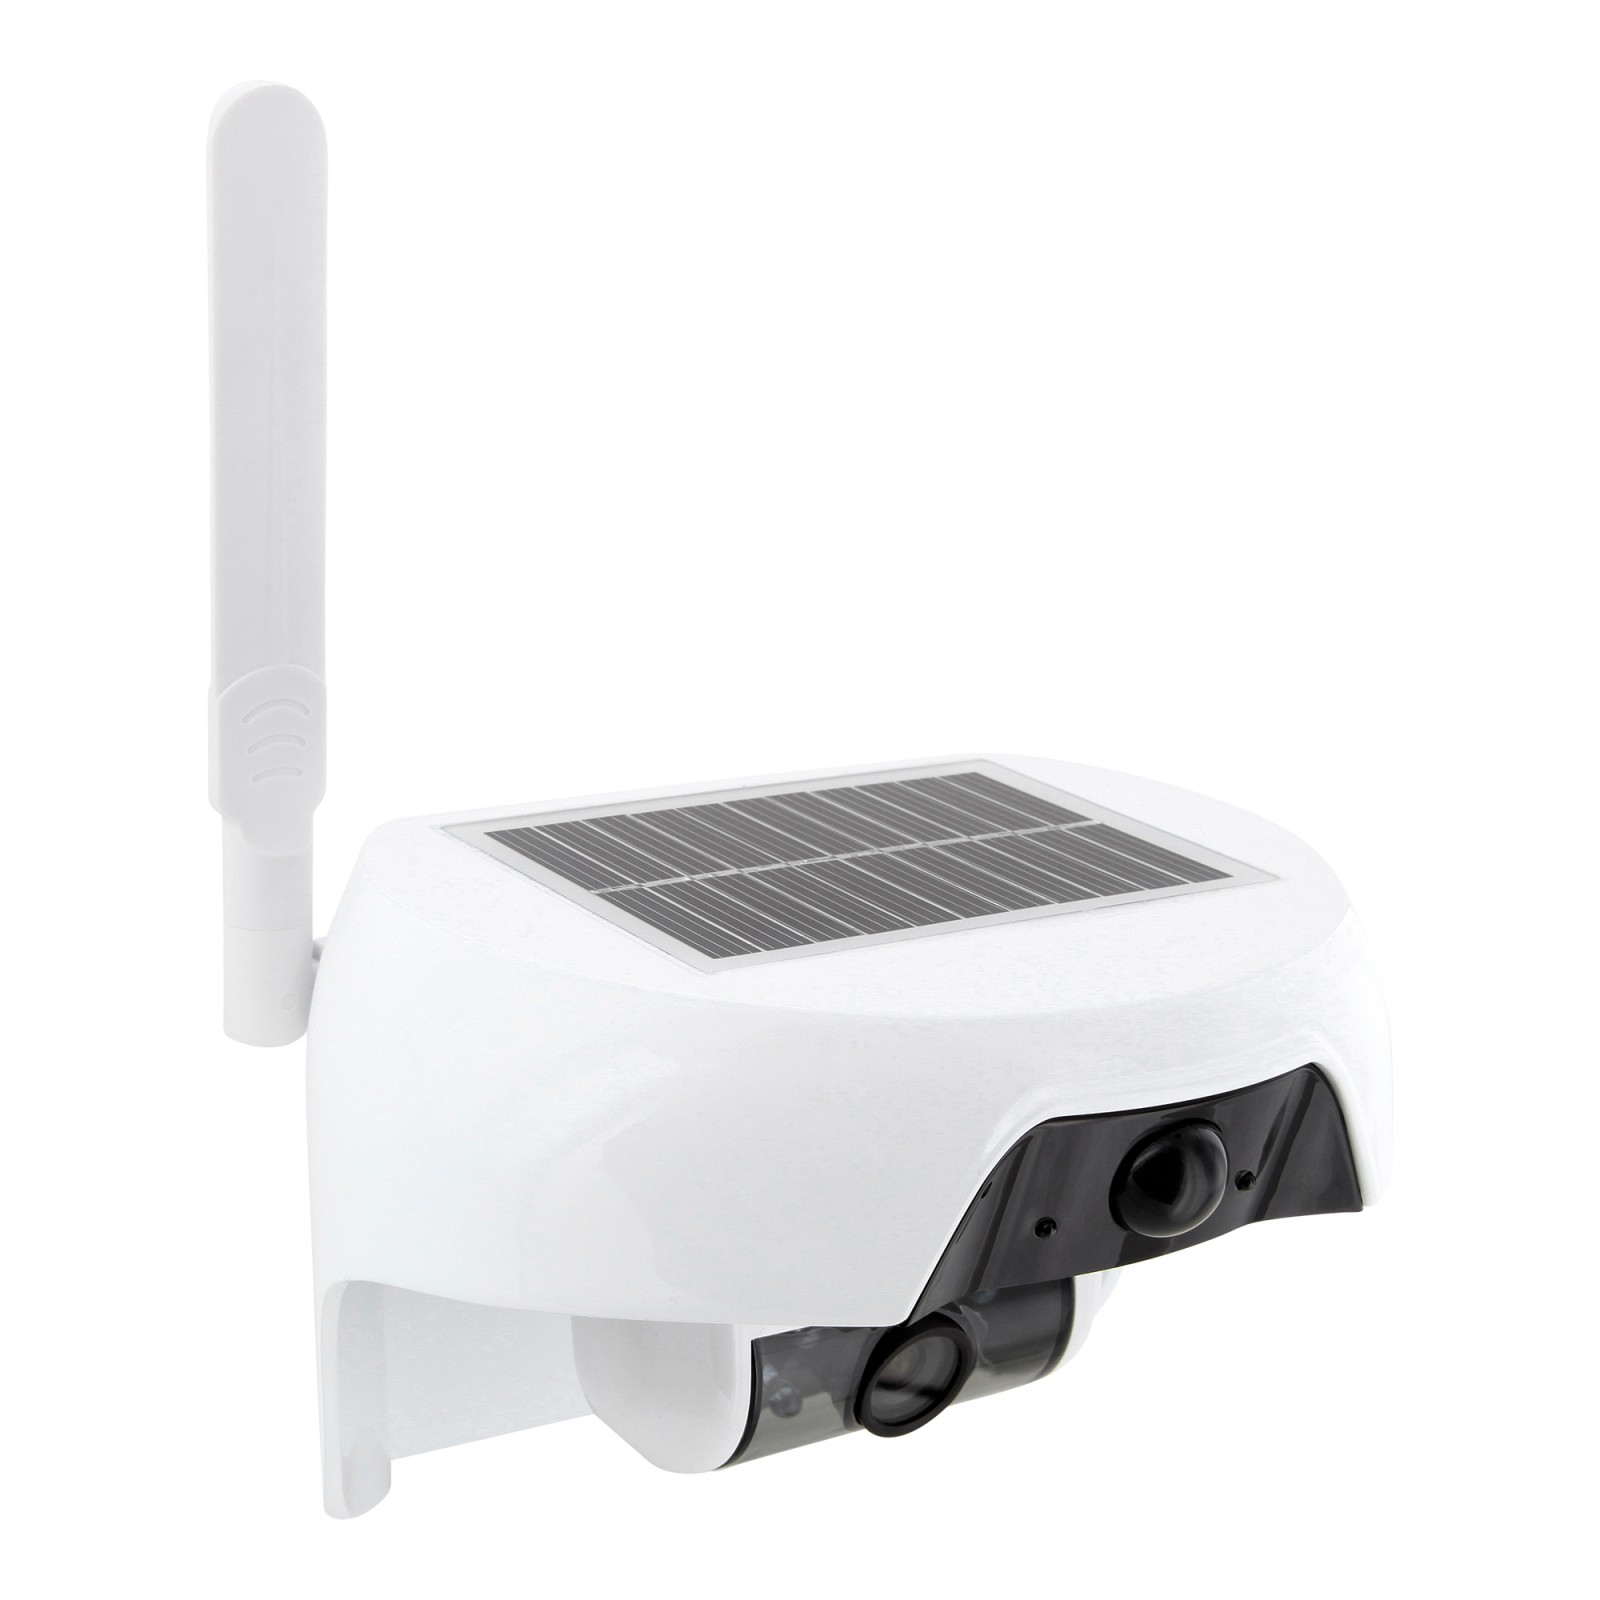 hd ip kamera mit solar panel wlan wifi akku berwachungskamera bewegungssensor ebay. Black Bedroom Furniture Sets. Home Design Ideas